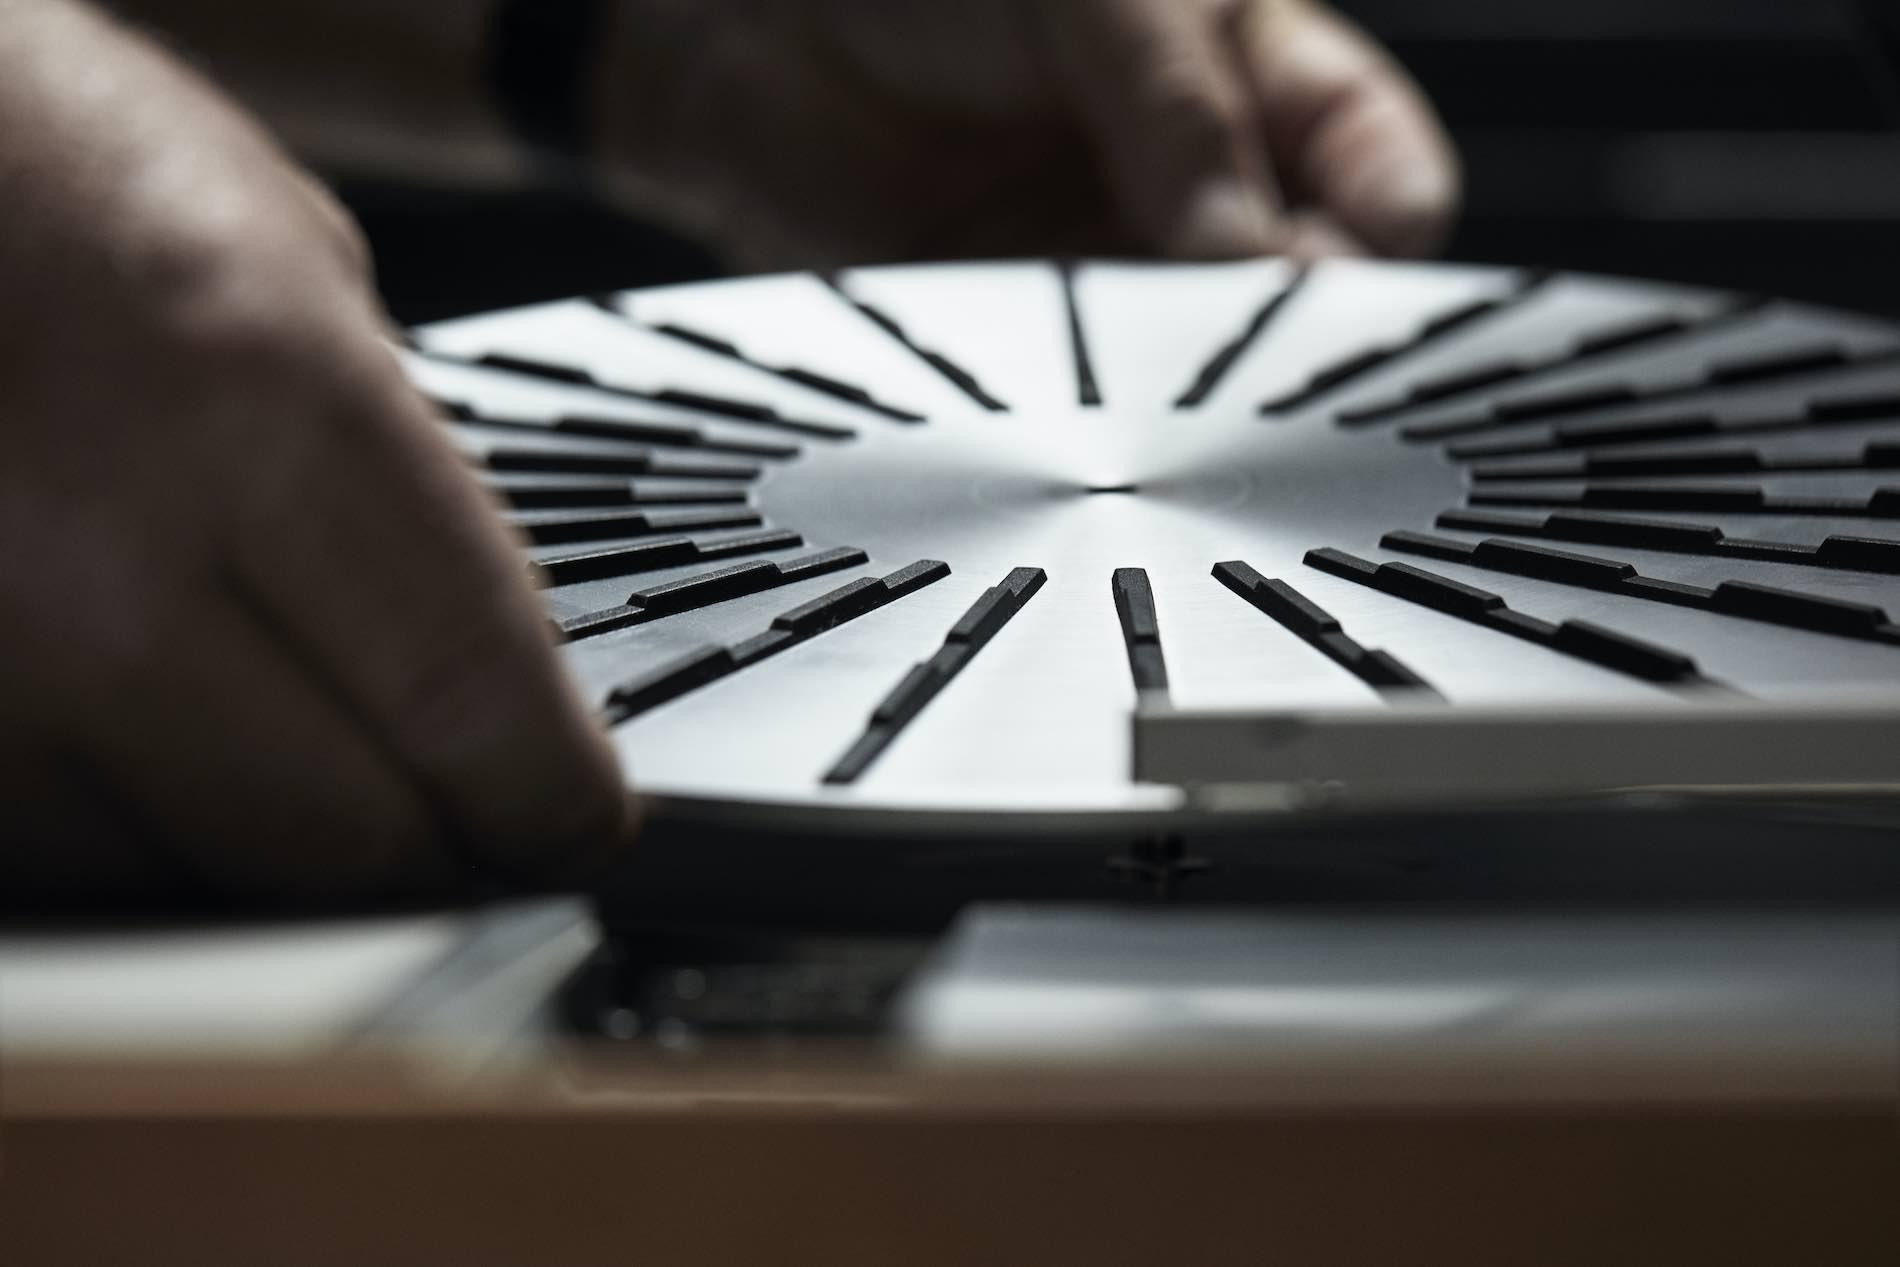 Beogram 4000, Bang und Olufsen Plattenspieler, dänisches Design, 3 daysofdesign, Bang & Olufsen